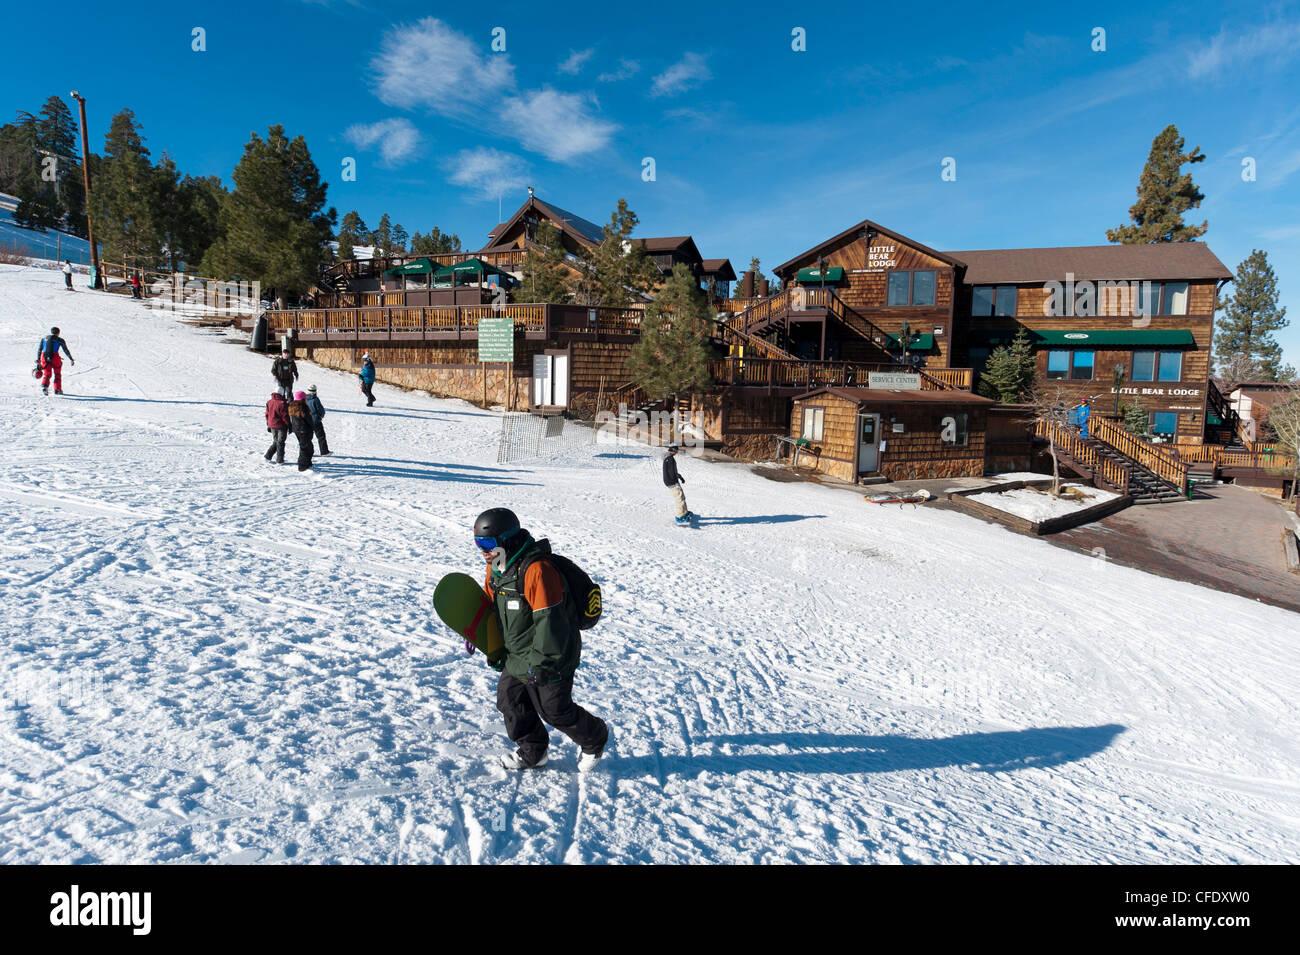 ski resort, big bear lake, california, united states of america